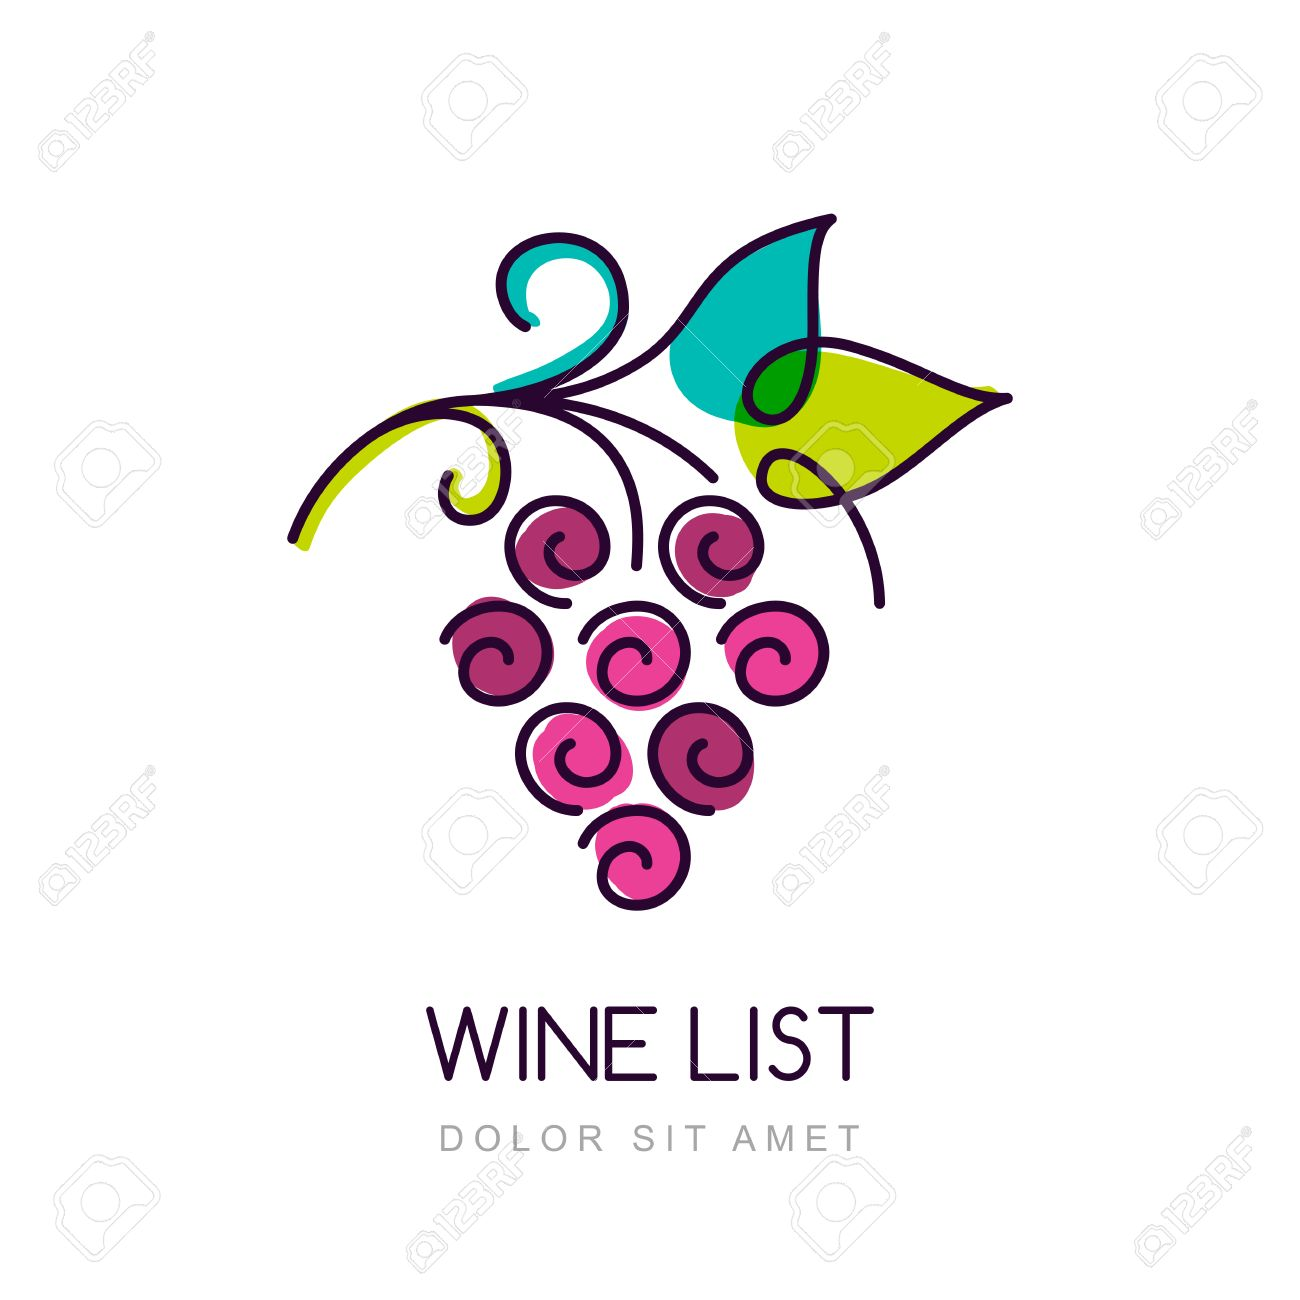 vector colorful grape vine design template concept for organic